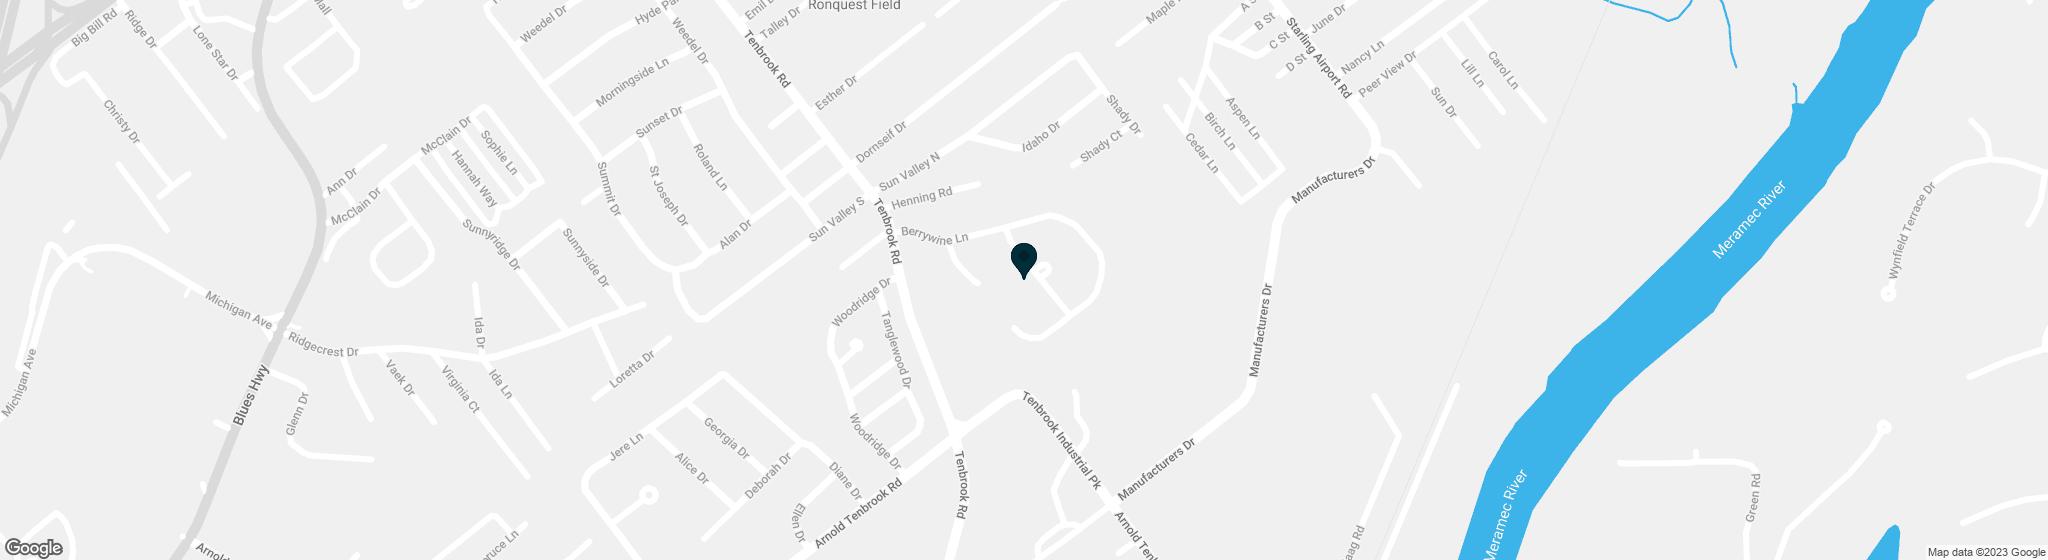 2417 Rosswood Lane Arnold MO 63010